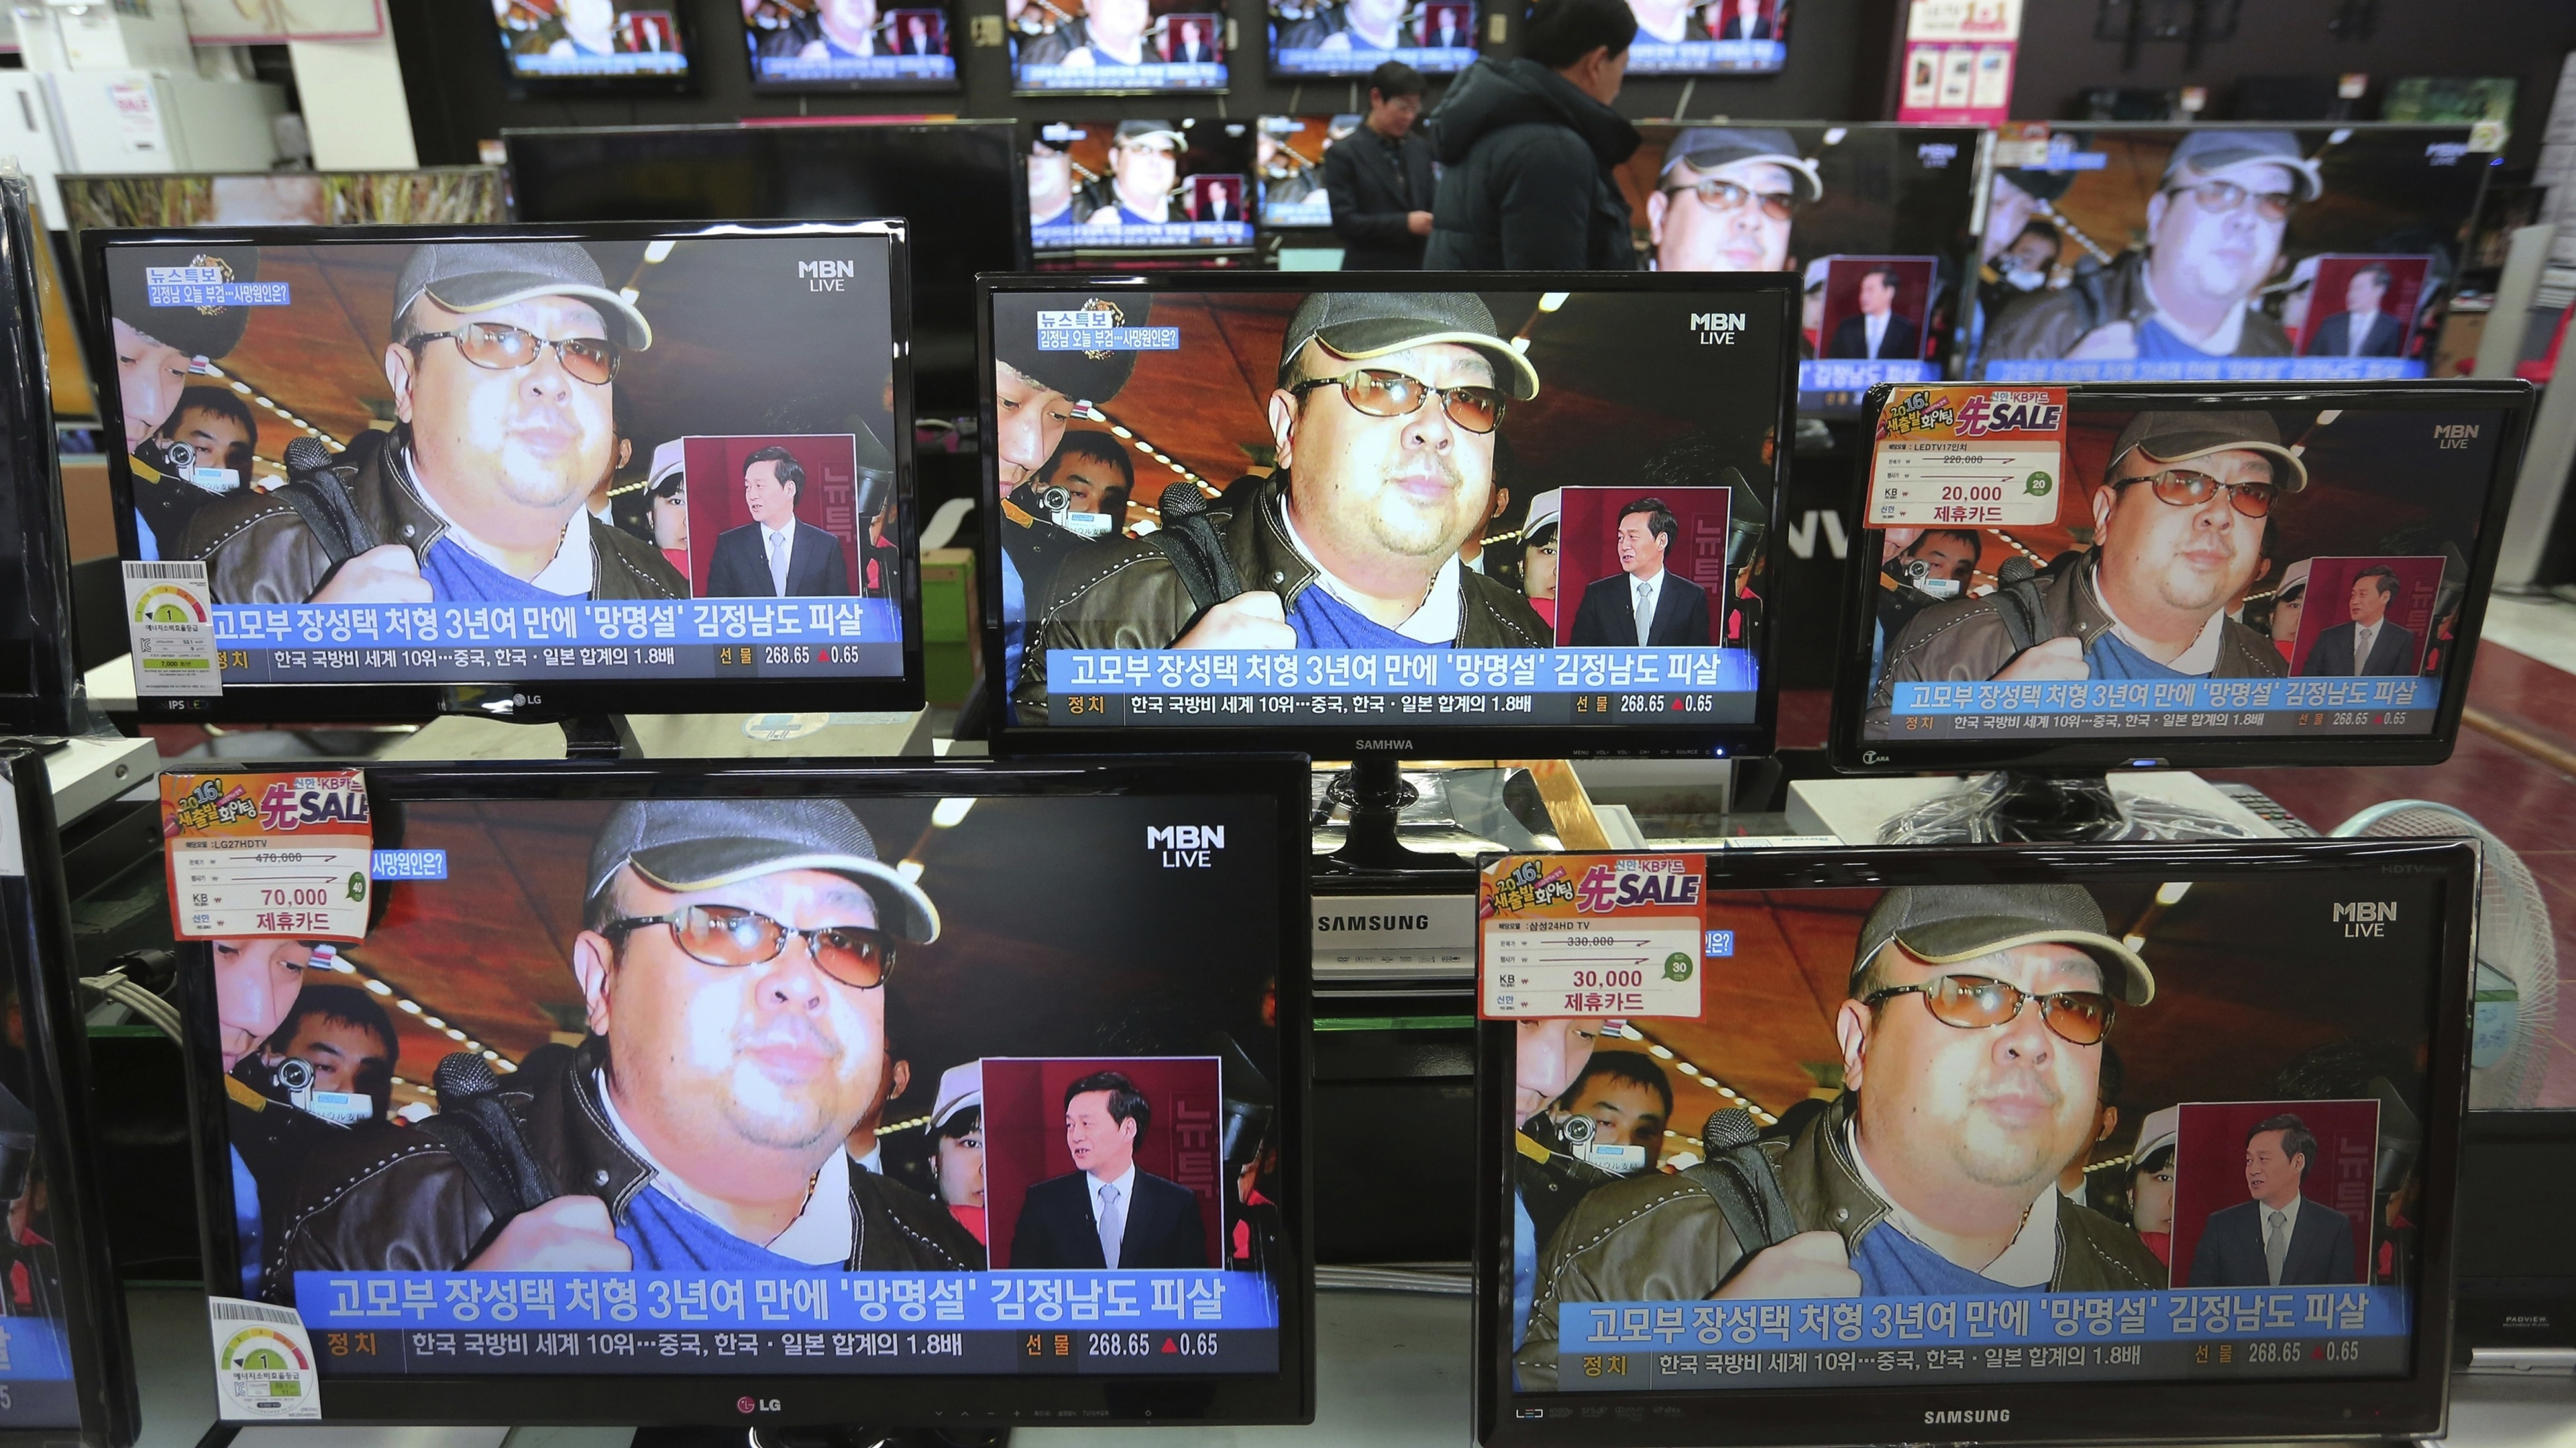 Kim Jong Un's estranged half-brother died in Malaysia last week.